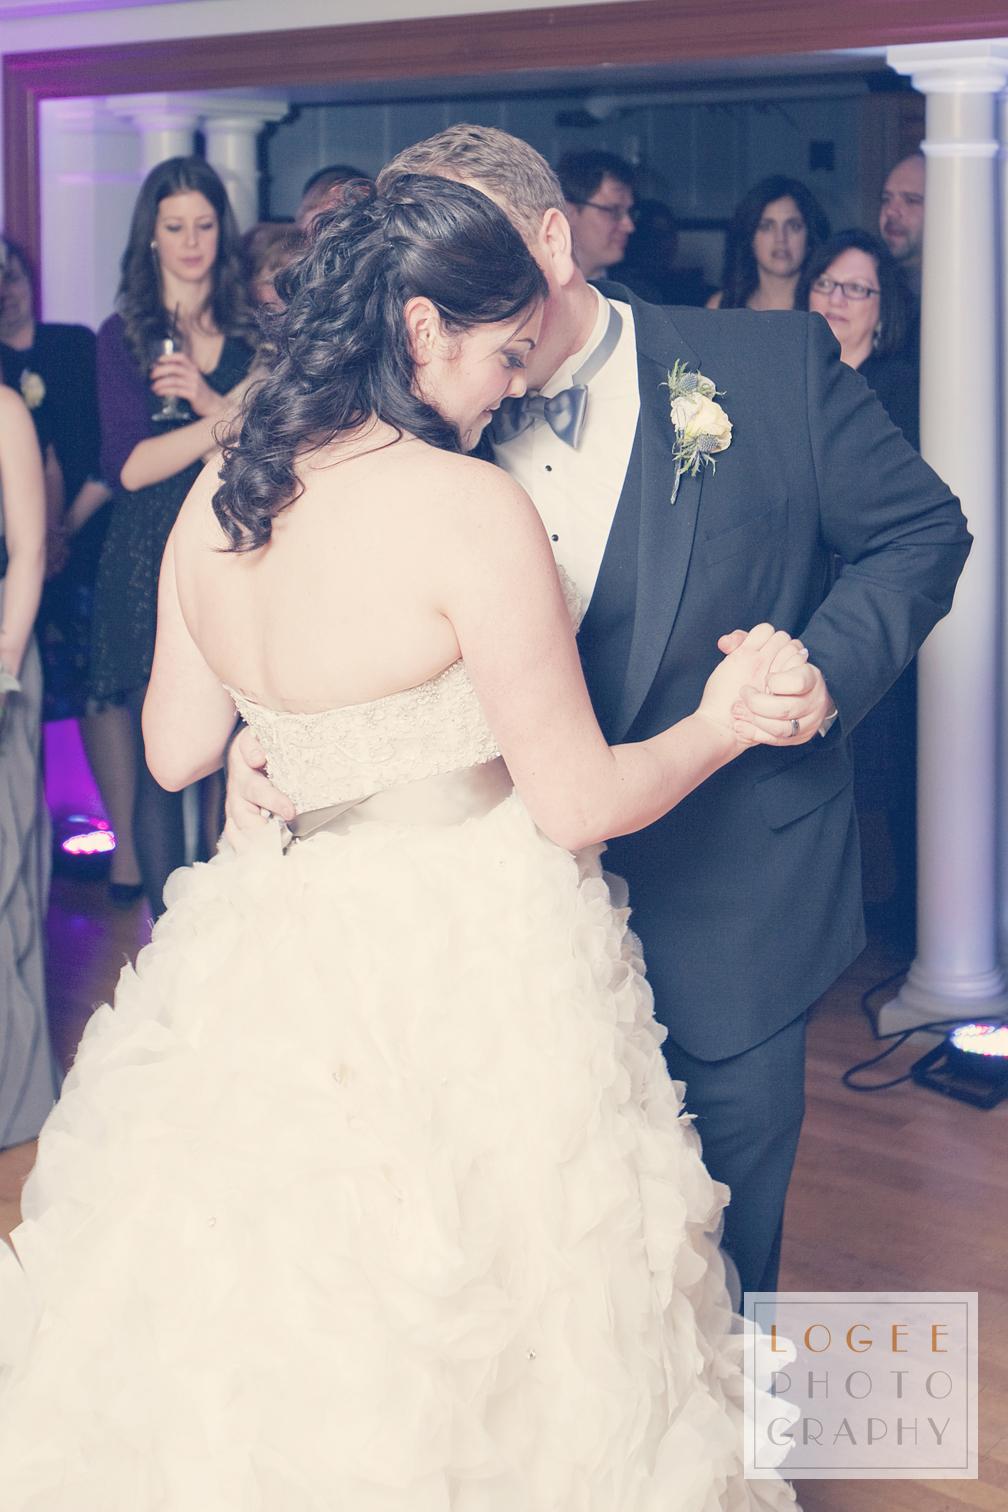 McIntosh-Burns Wedding - 7182Cw